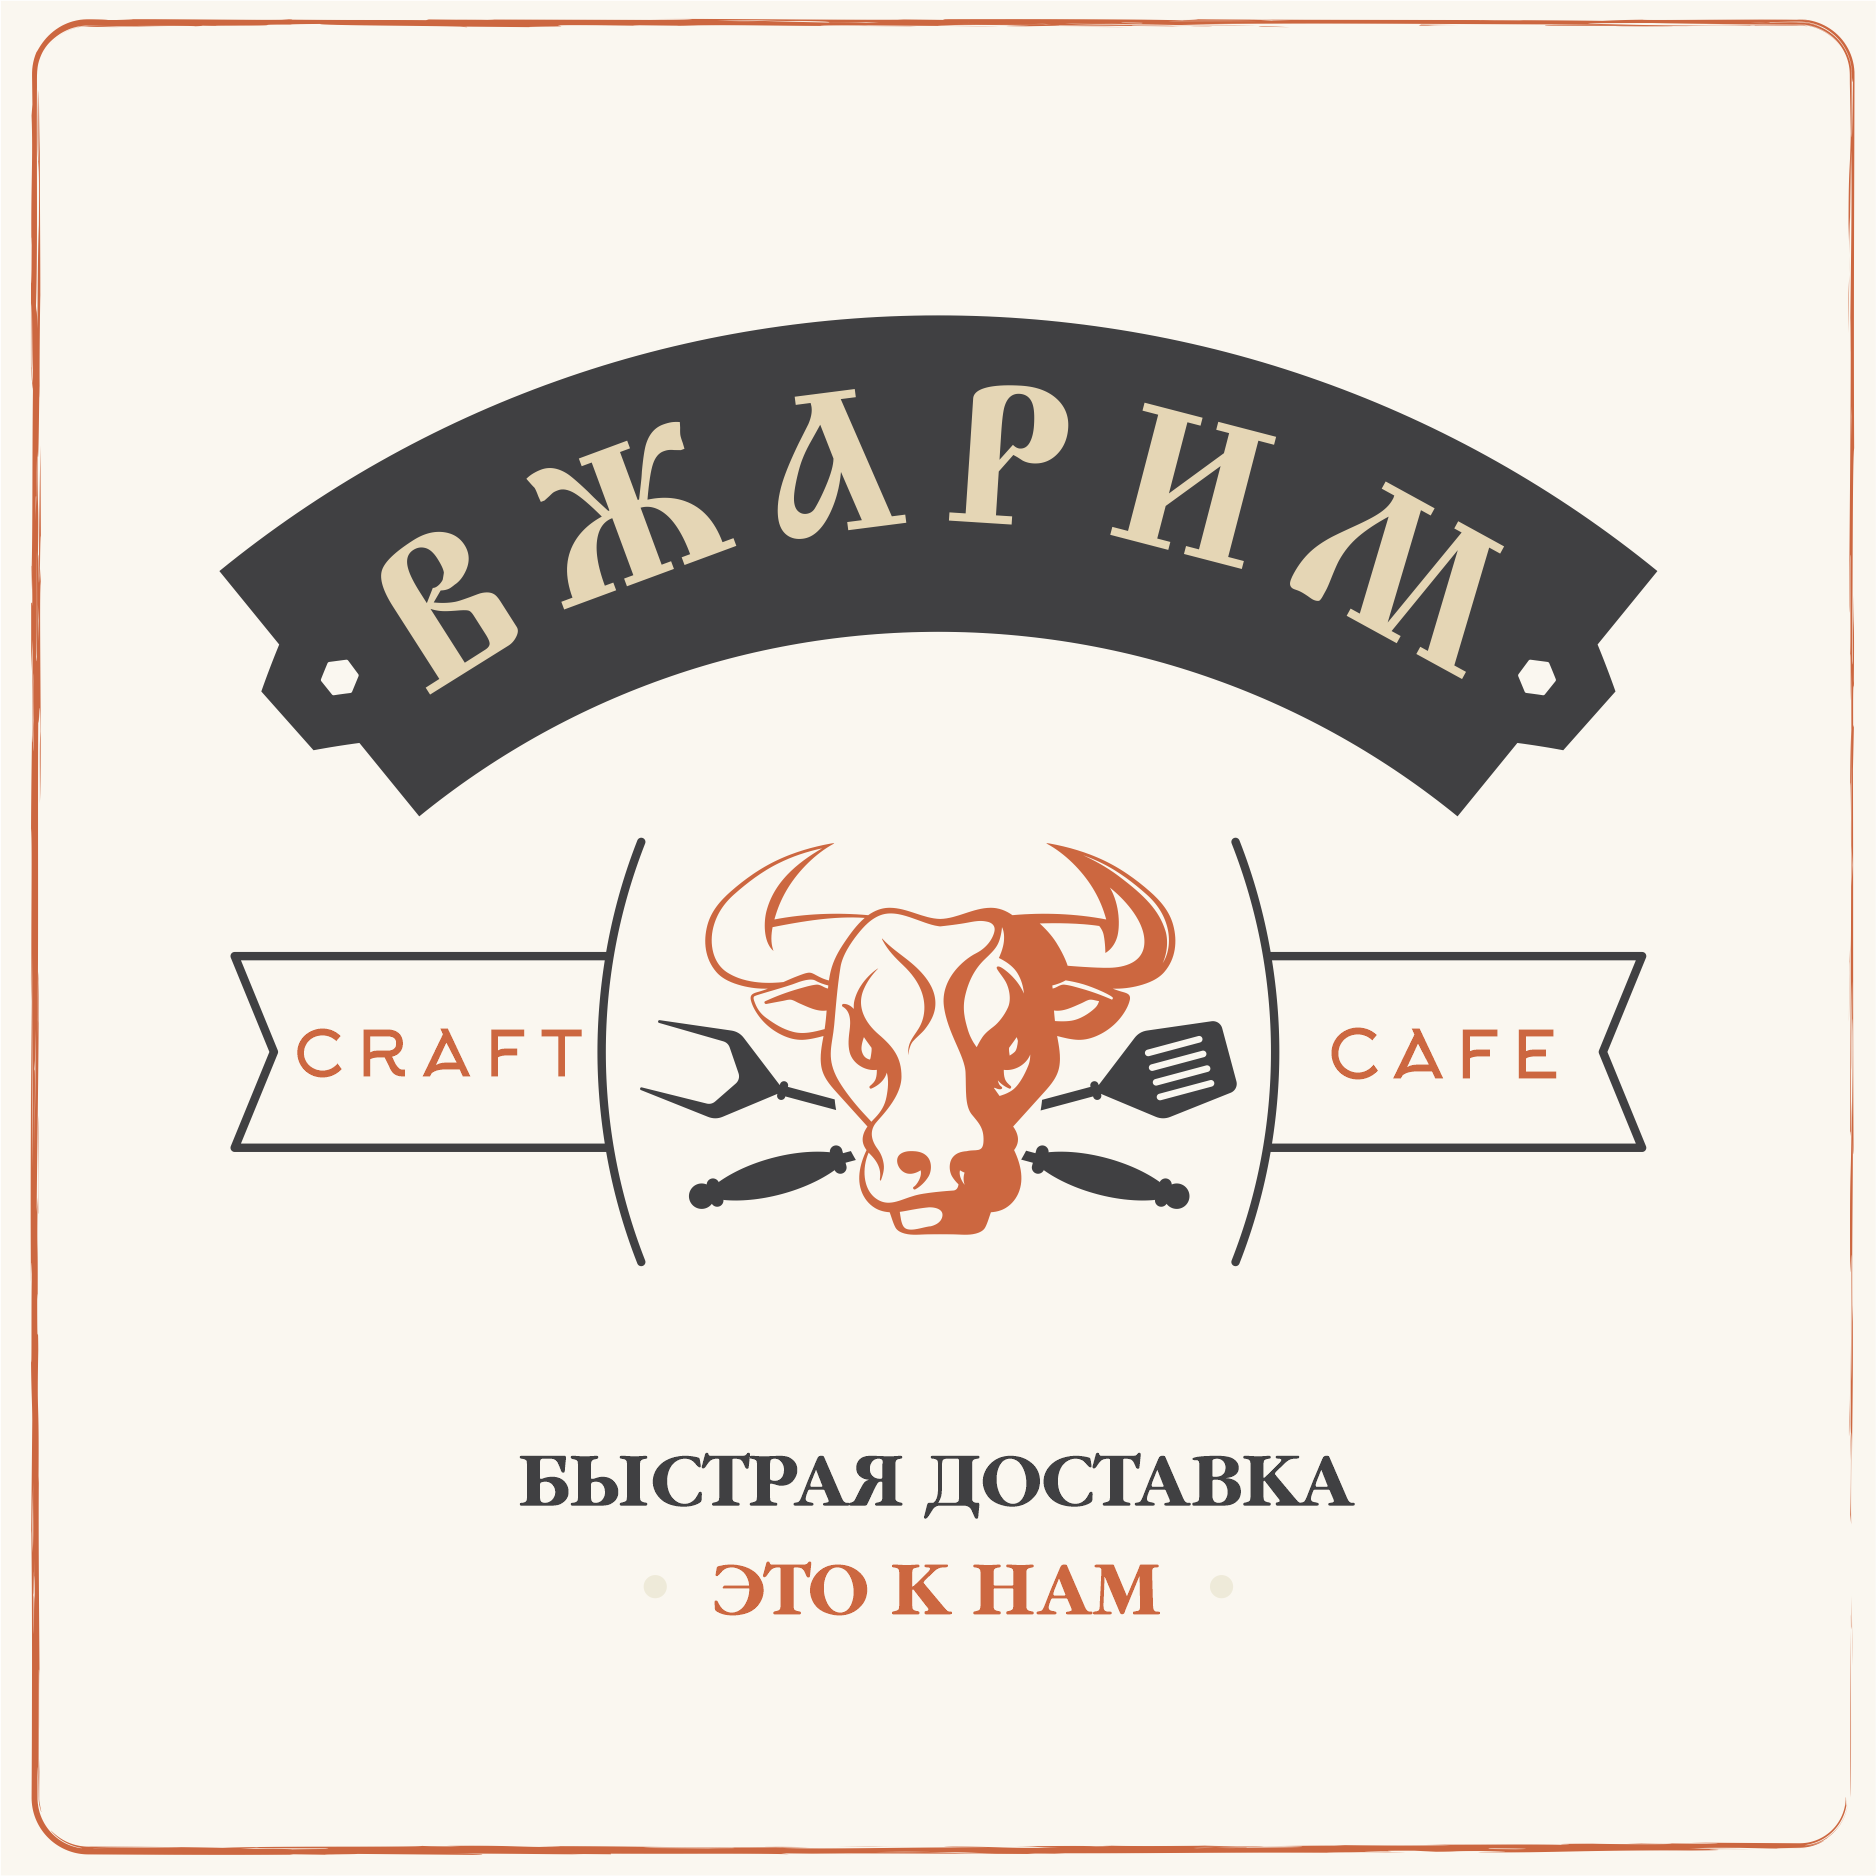 Требуется, разработка логотипа для крафт-кафе «ВЖАРИМ». фото f_2046015130f14926.png